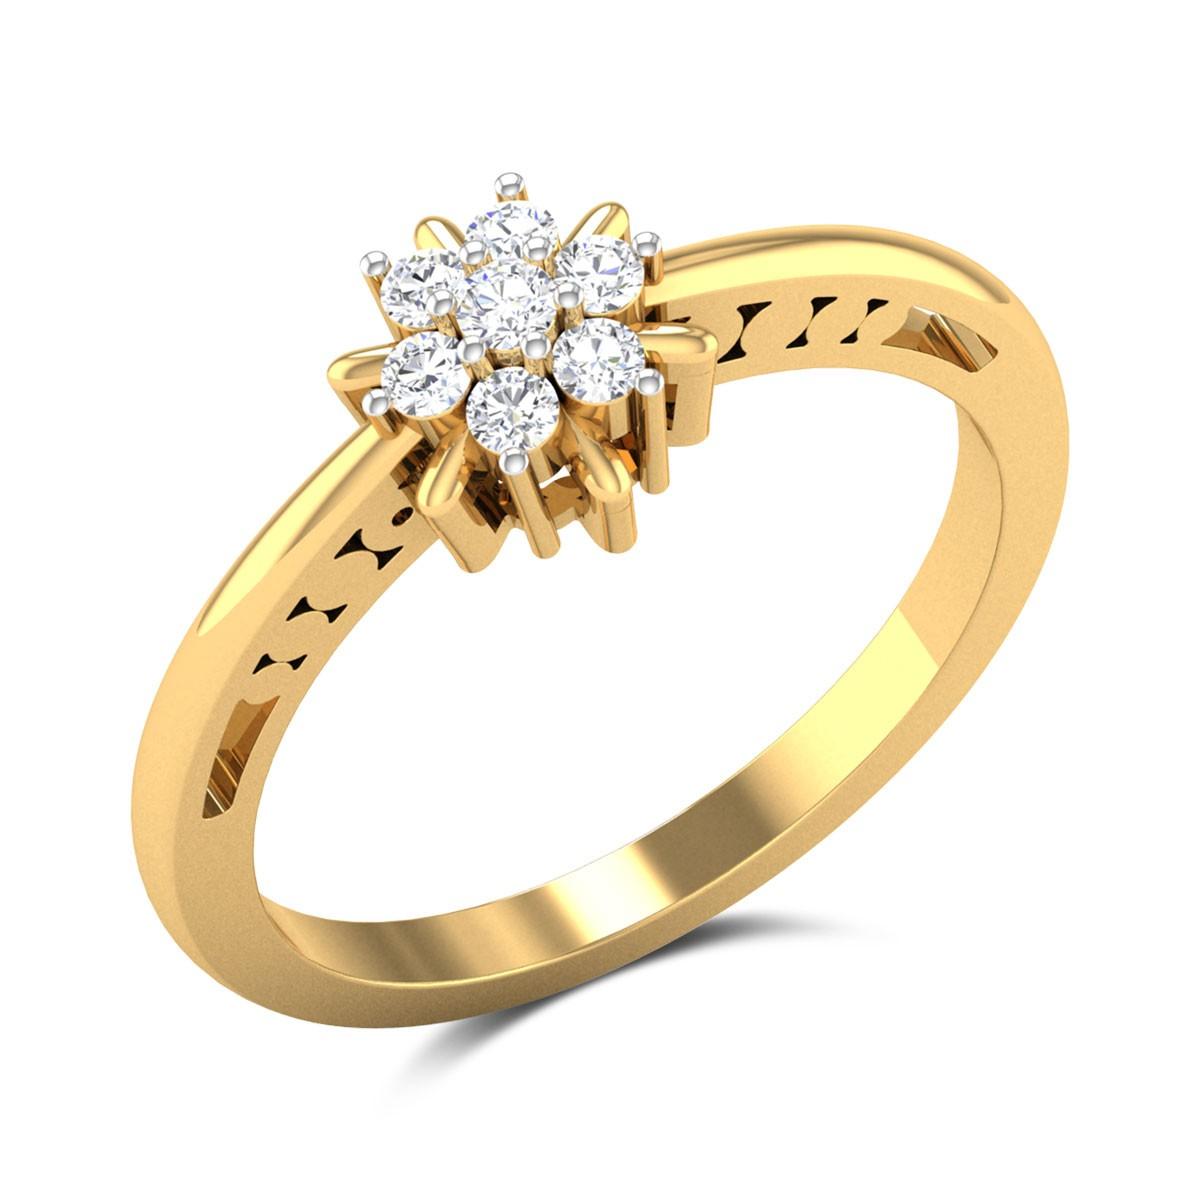 Caitlyn Diamond Ring